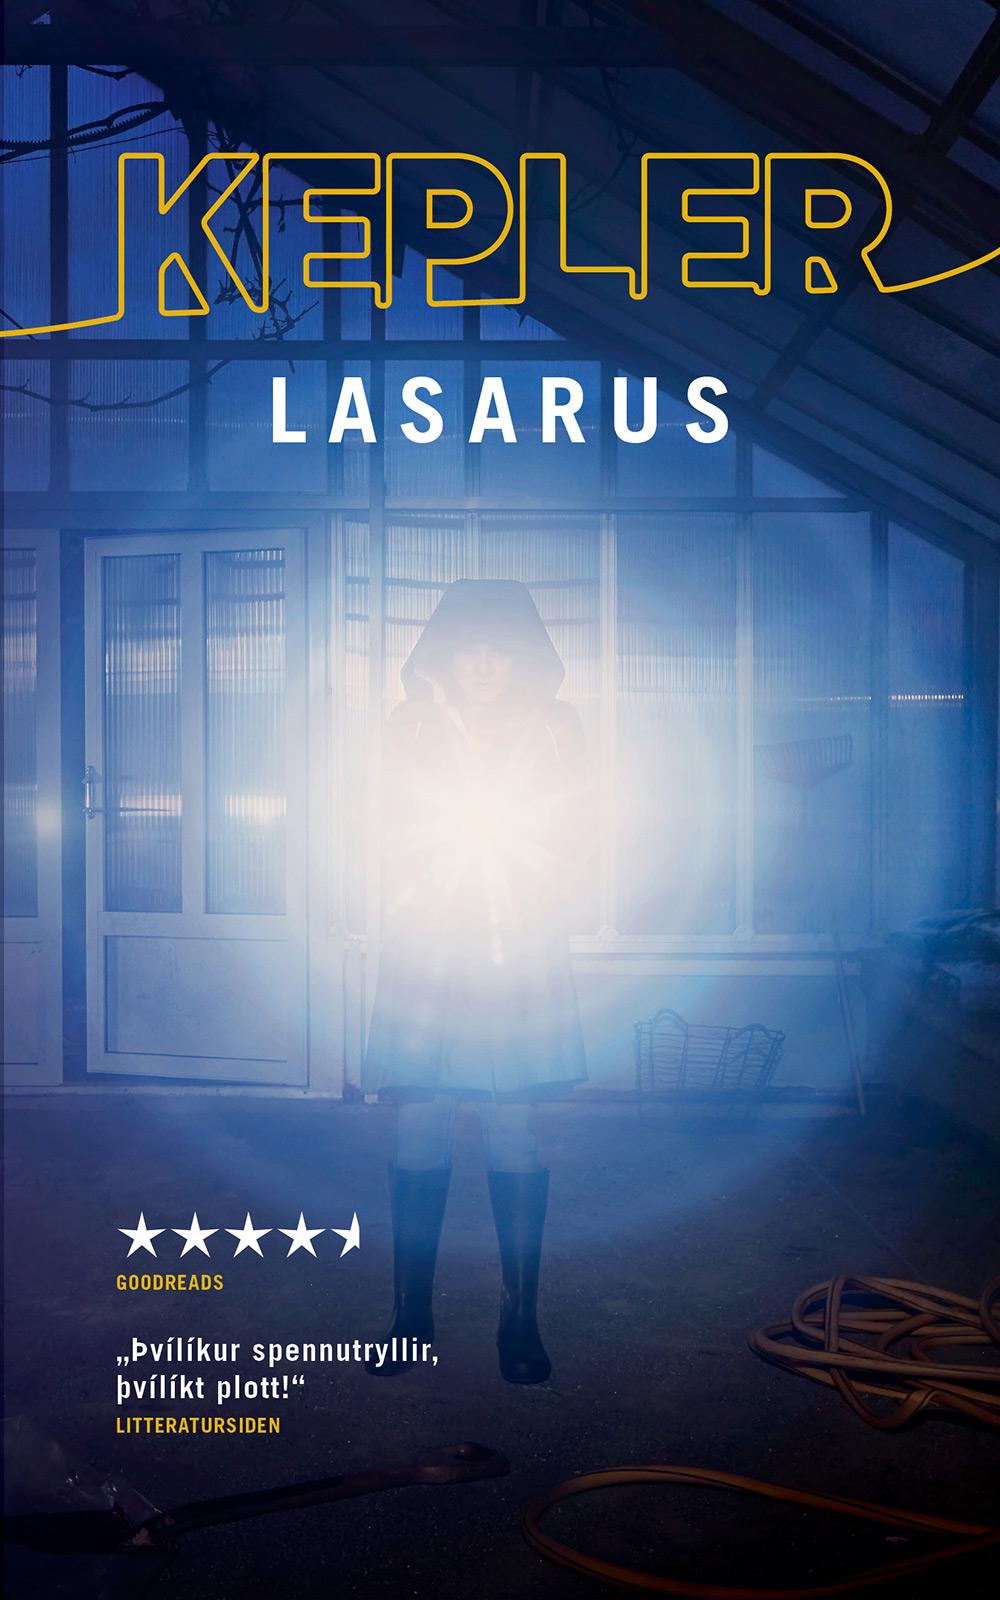 Lasarus - Lars Kepler